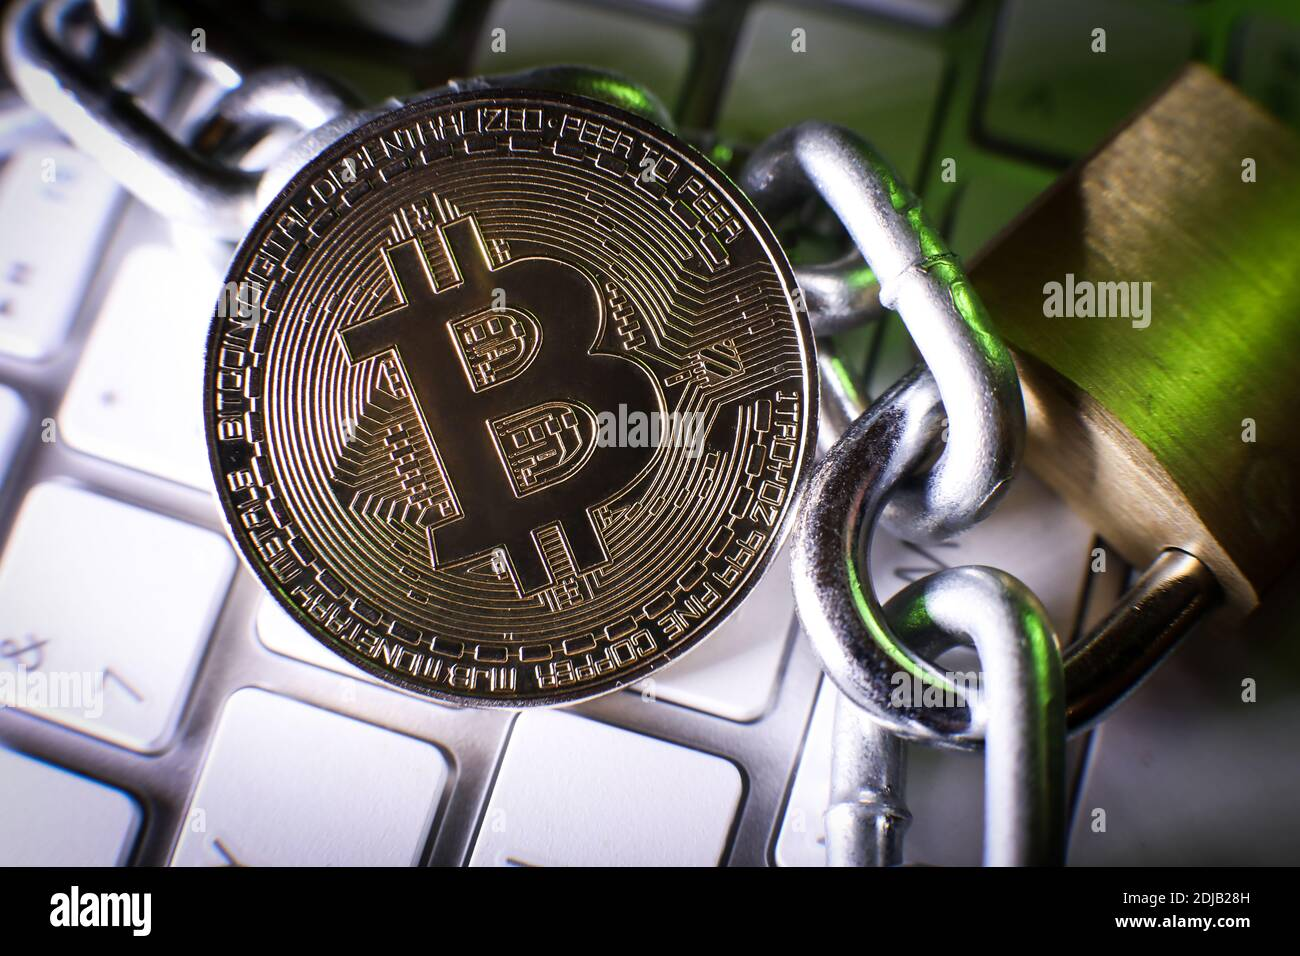 Djb crypto currency binary options trading 2021 calendar